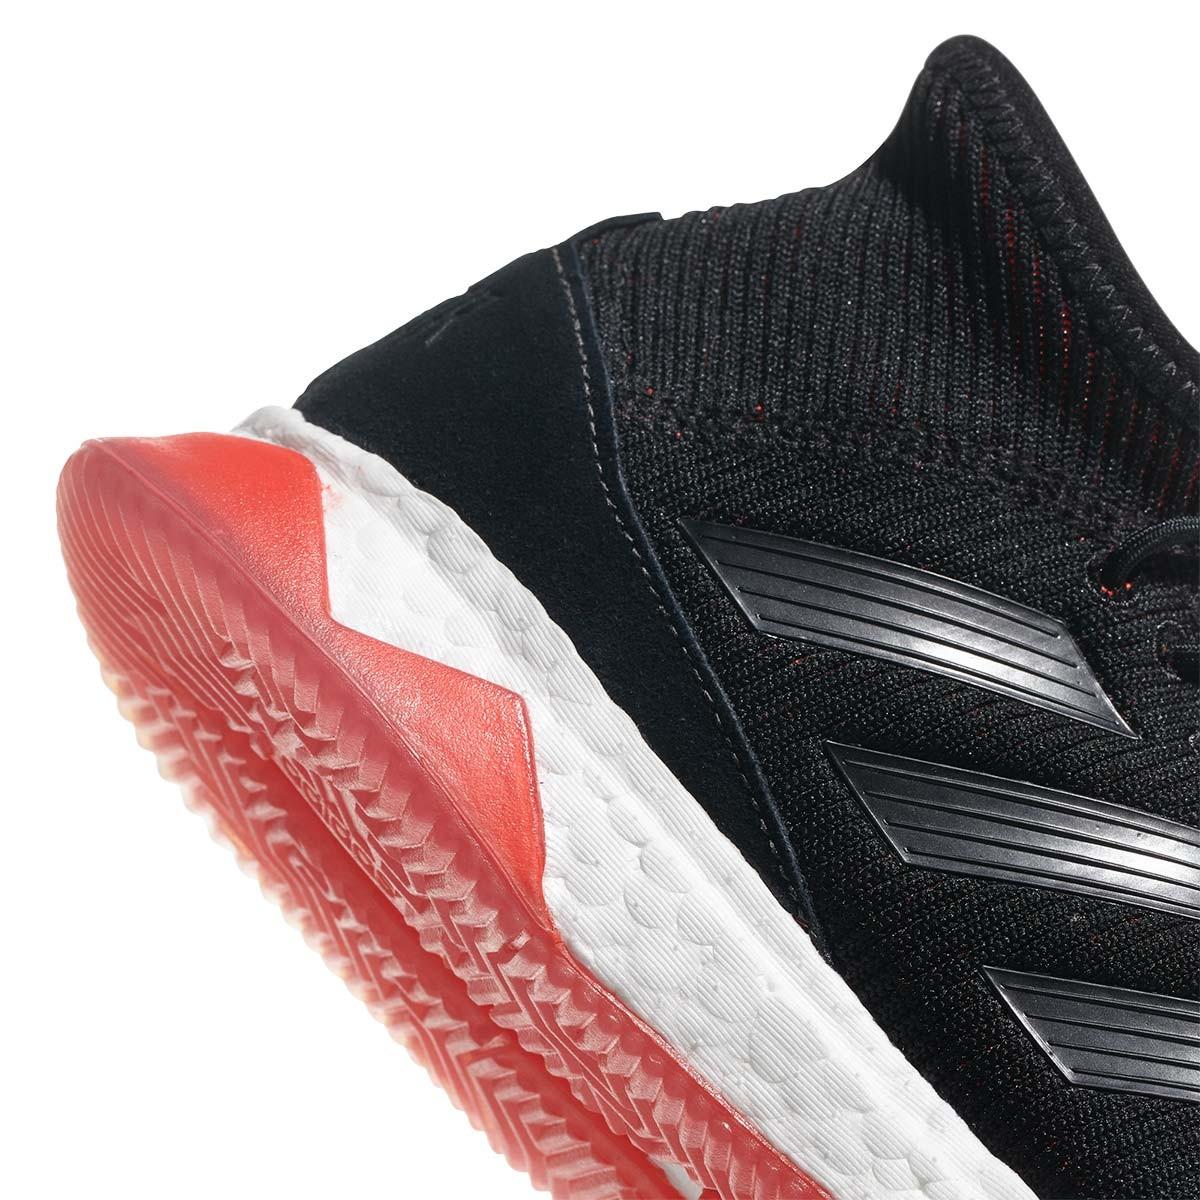 902344f76498 Trainers adidas Predator Tango 18.1 TR White-Core black-Real coral -  Football store Fútbol Emotion